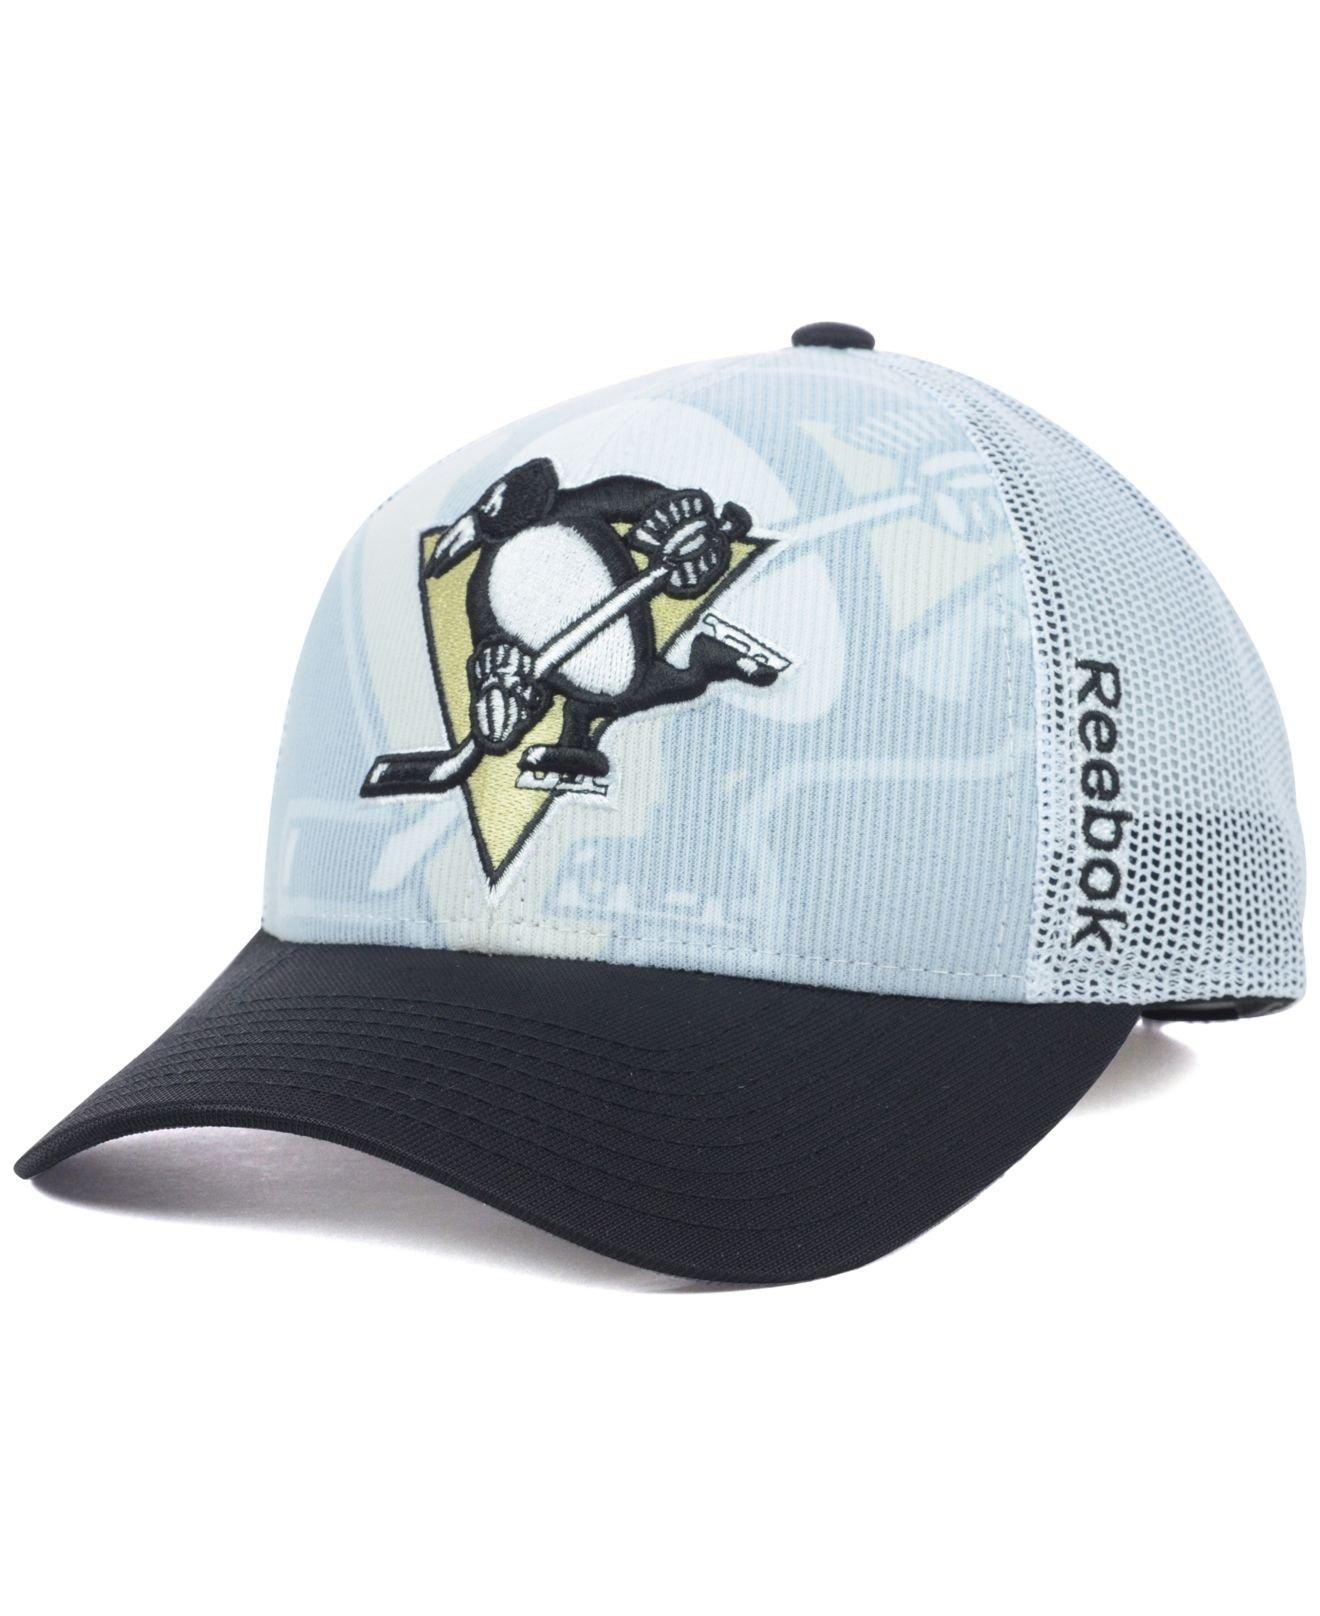 Lyst - Reebok Pittsburgh Penguins Nhl 2014 Draft Cap for Men 359da9d6a1c0